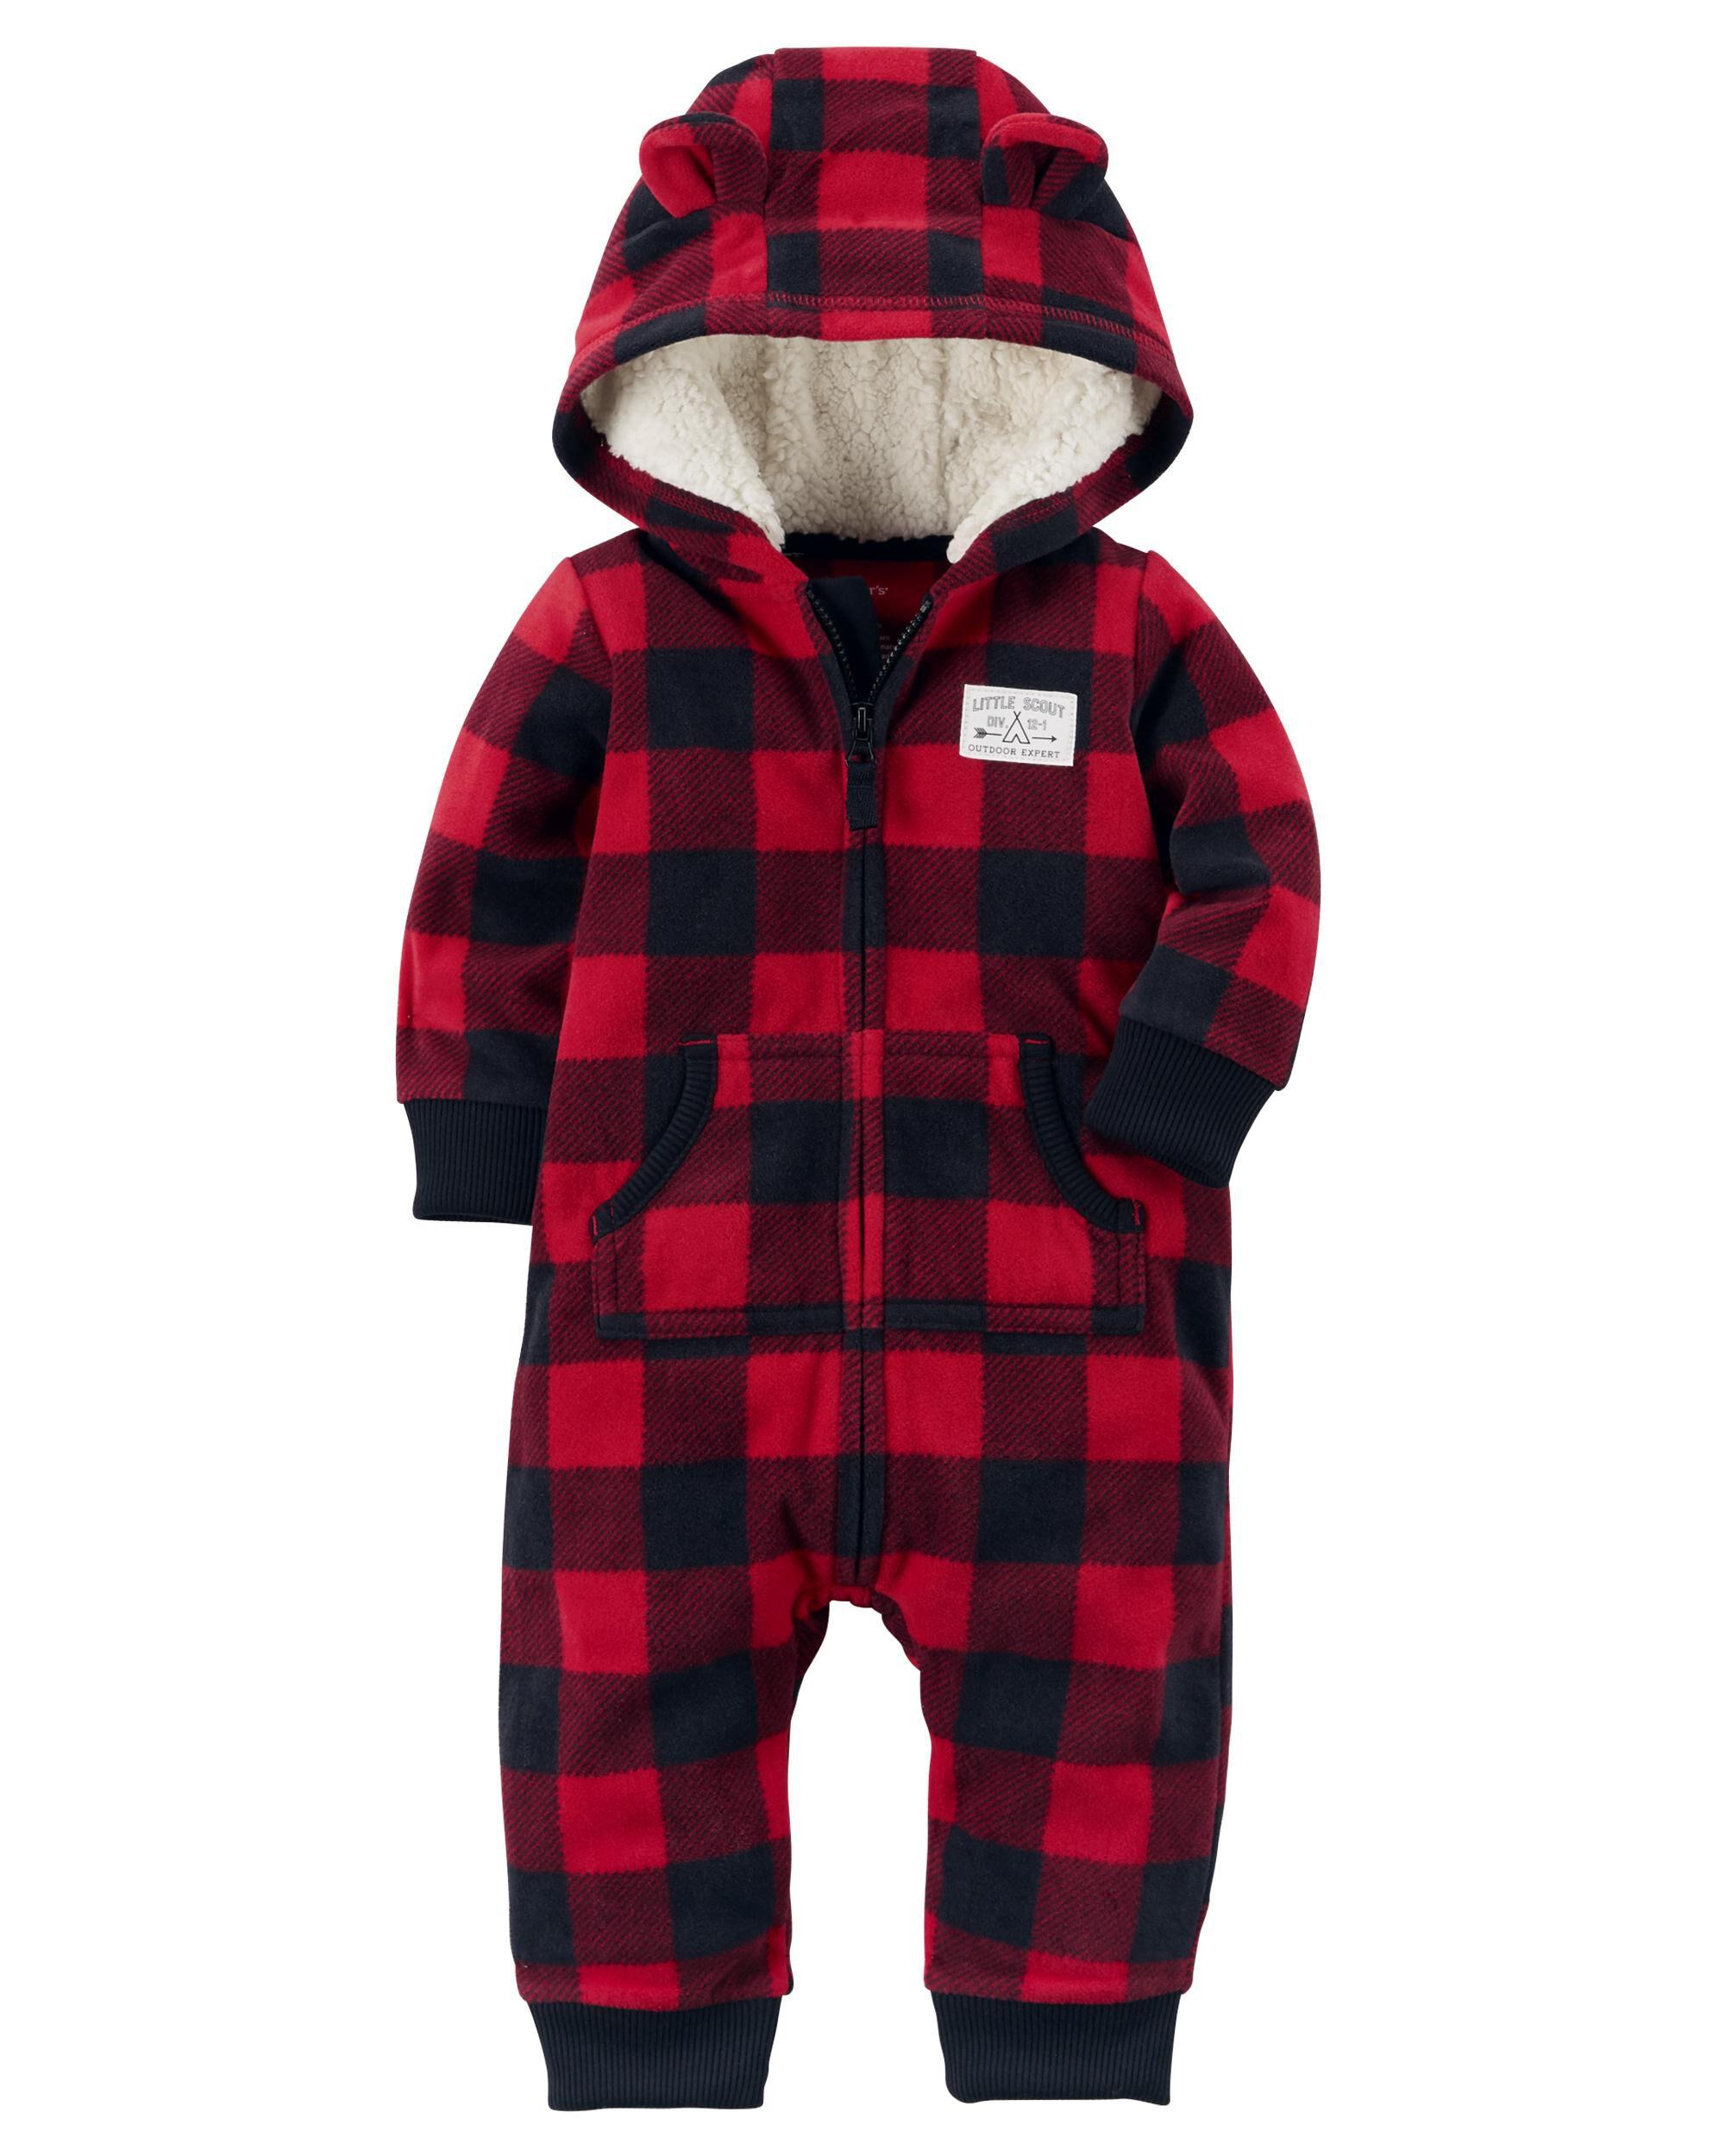 Buffalo Check Fleece Jumpsuit   Carters.com